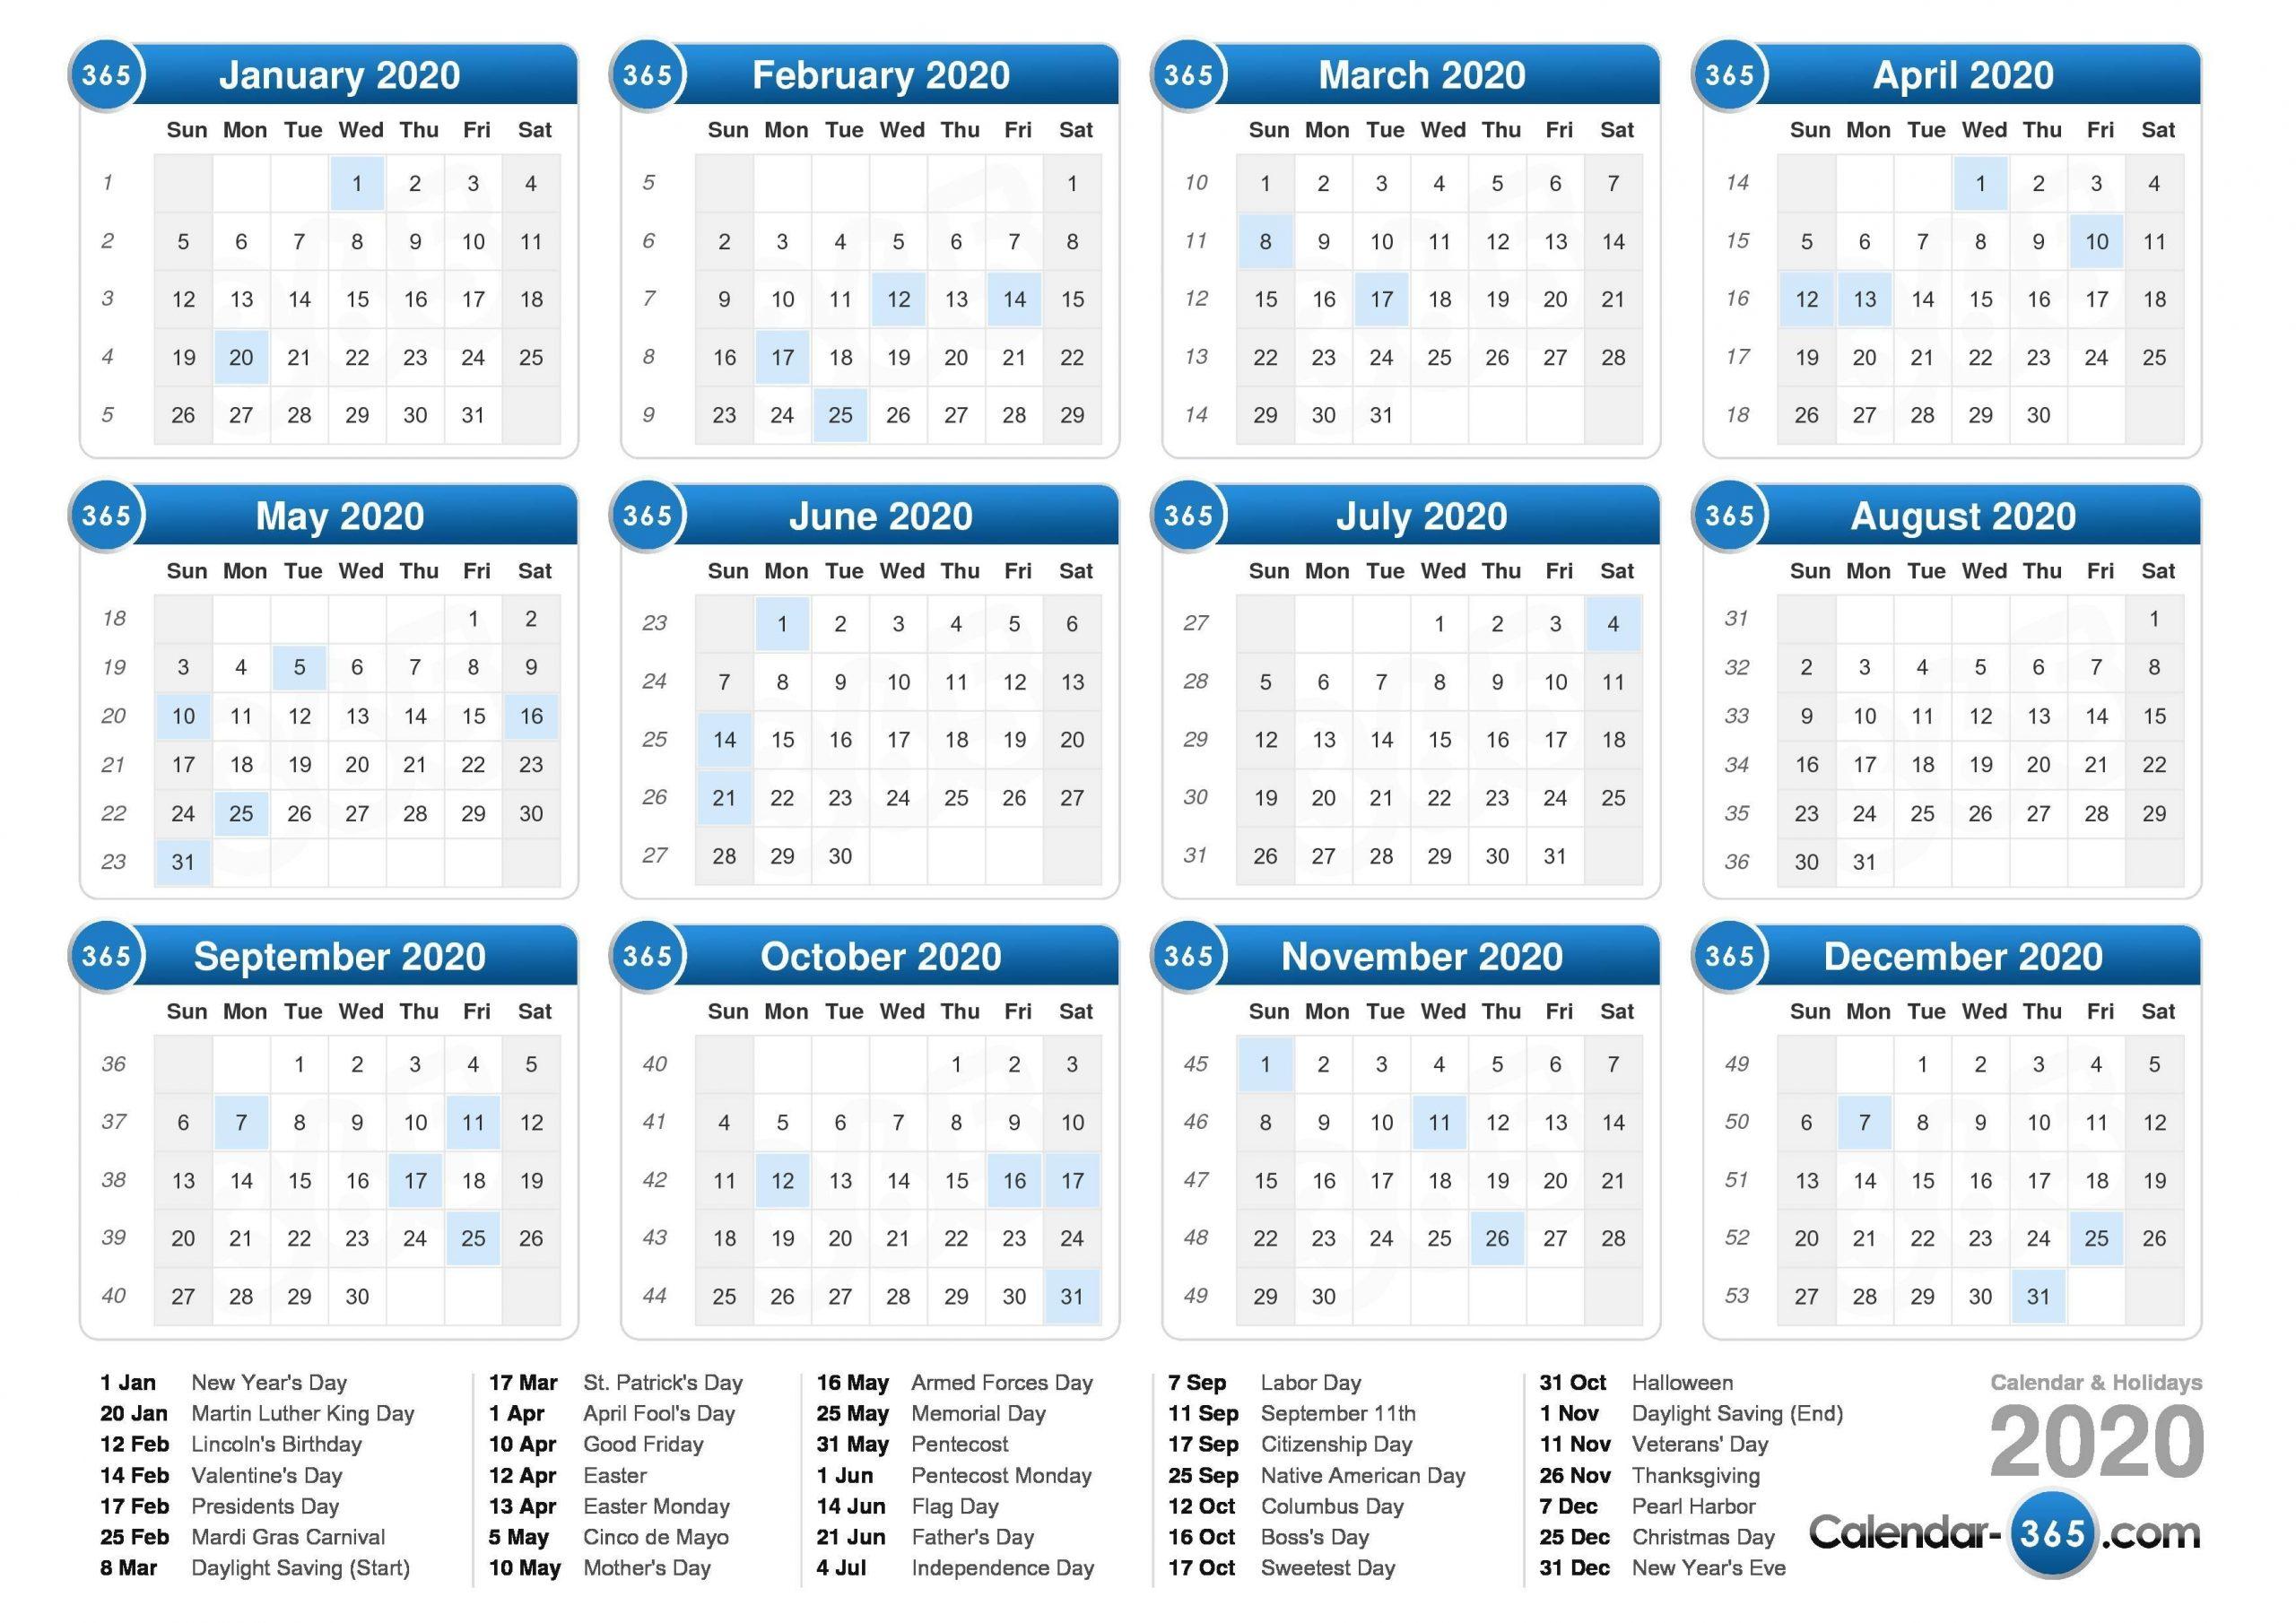 2020 Calendar regarding 2020 Calender Year Week Wise